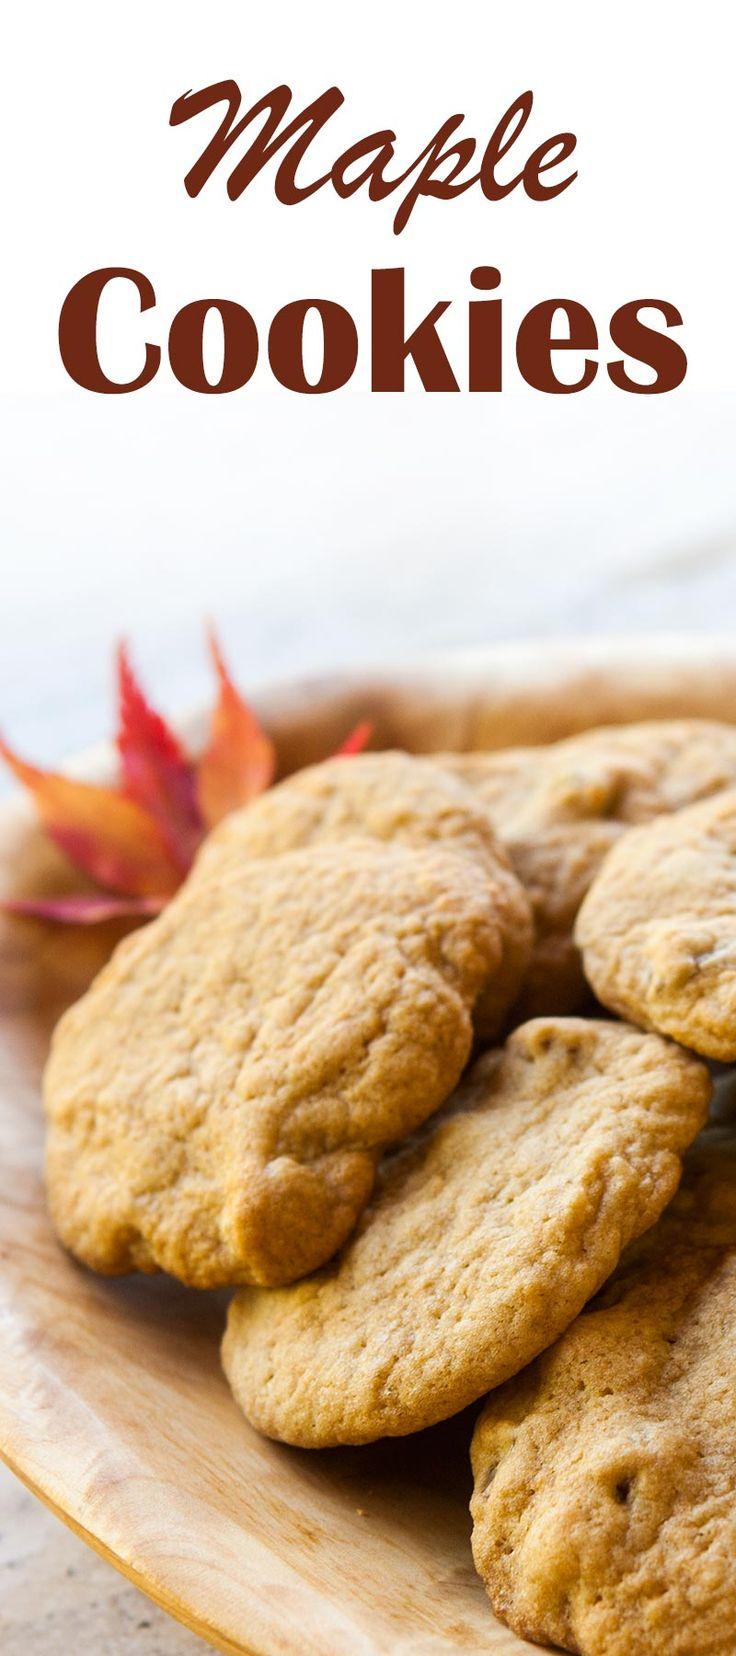 25+ best ideas about Maple cookies on Pinterest | Maple ...